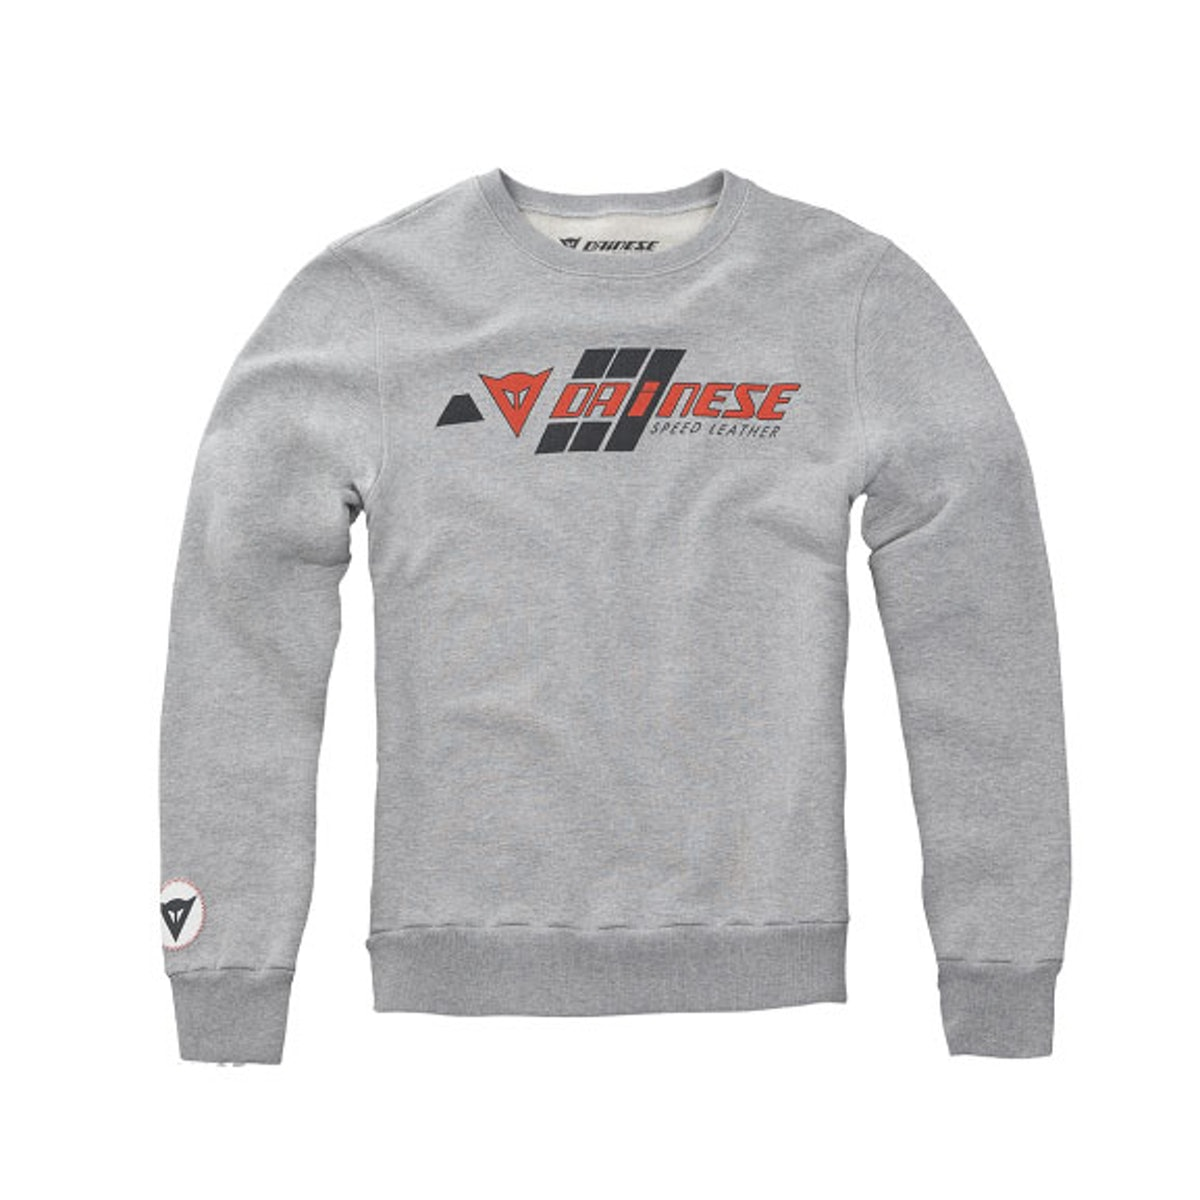 Dainese Felpa Speed Leather crew neck sweatshirt